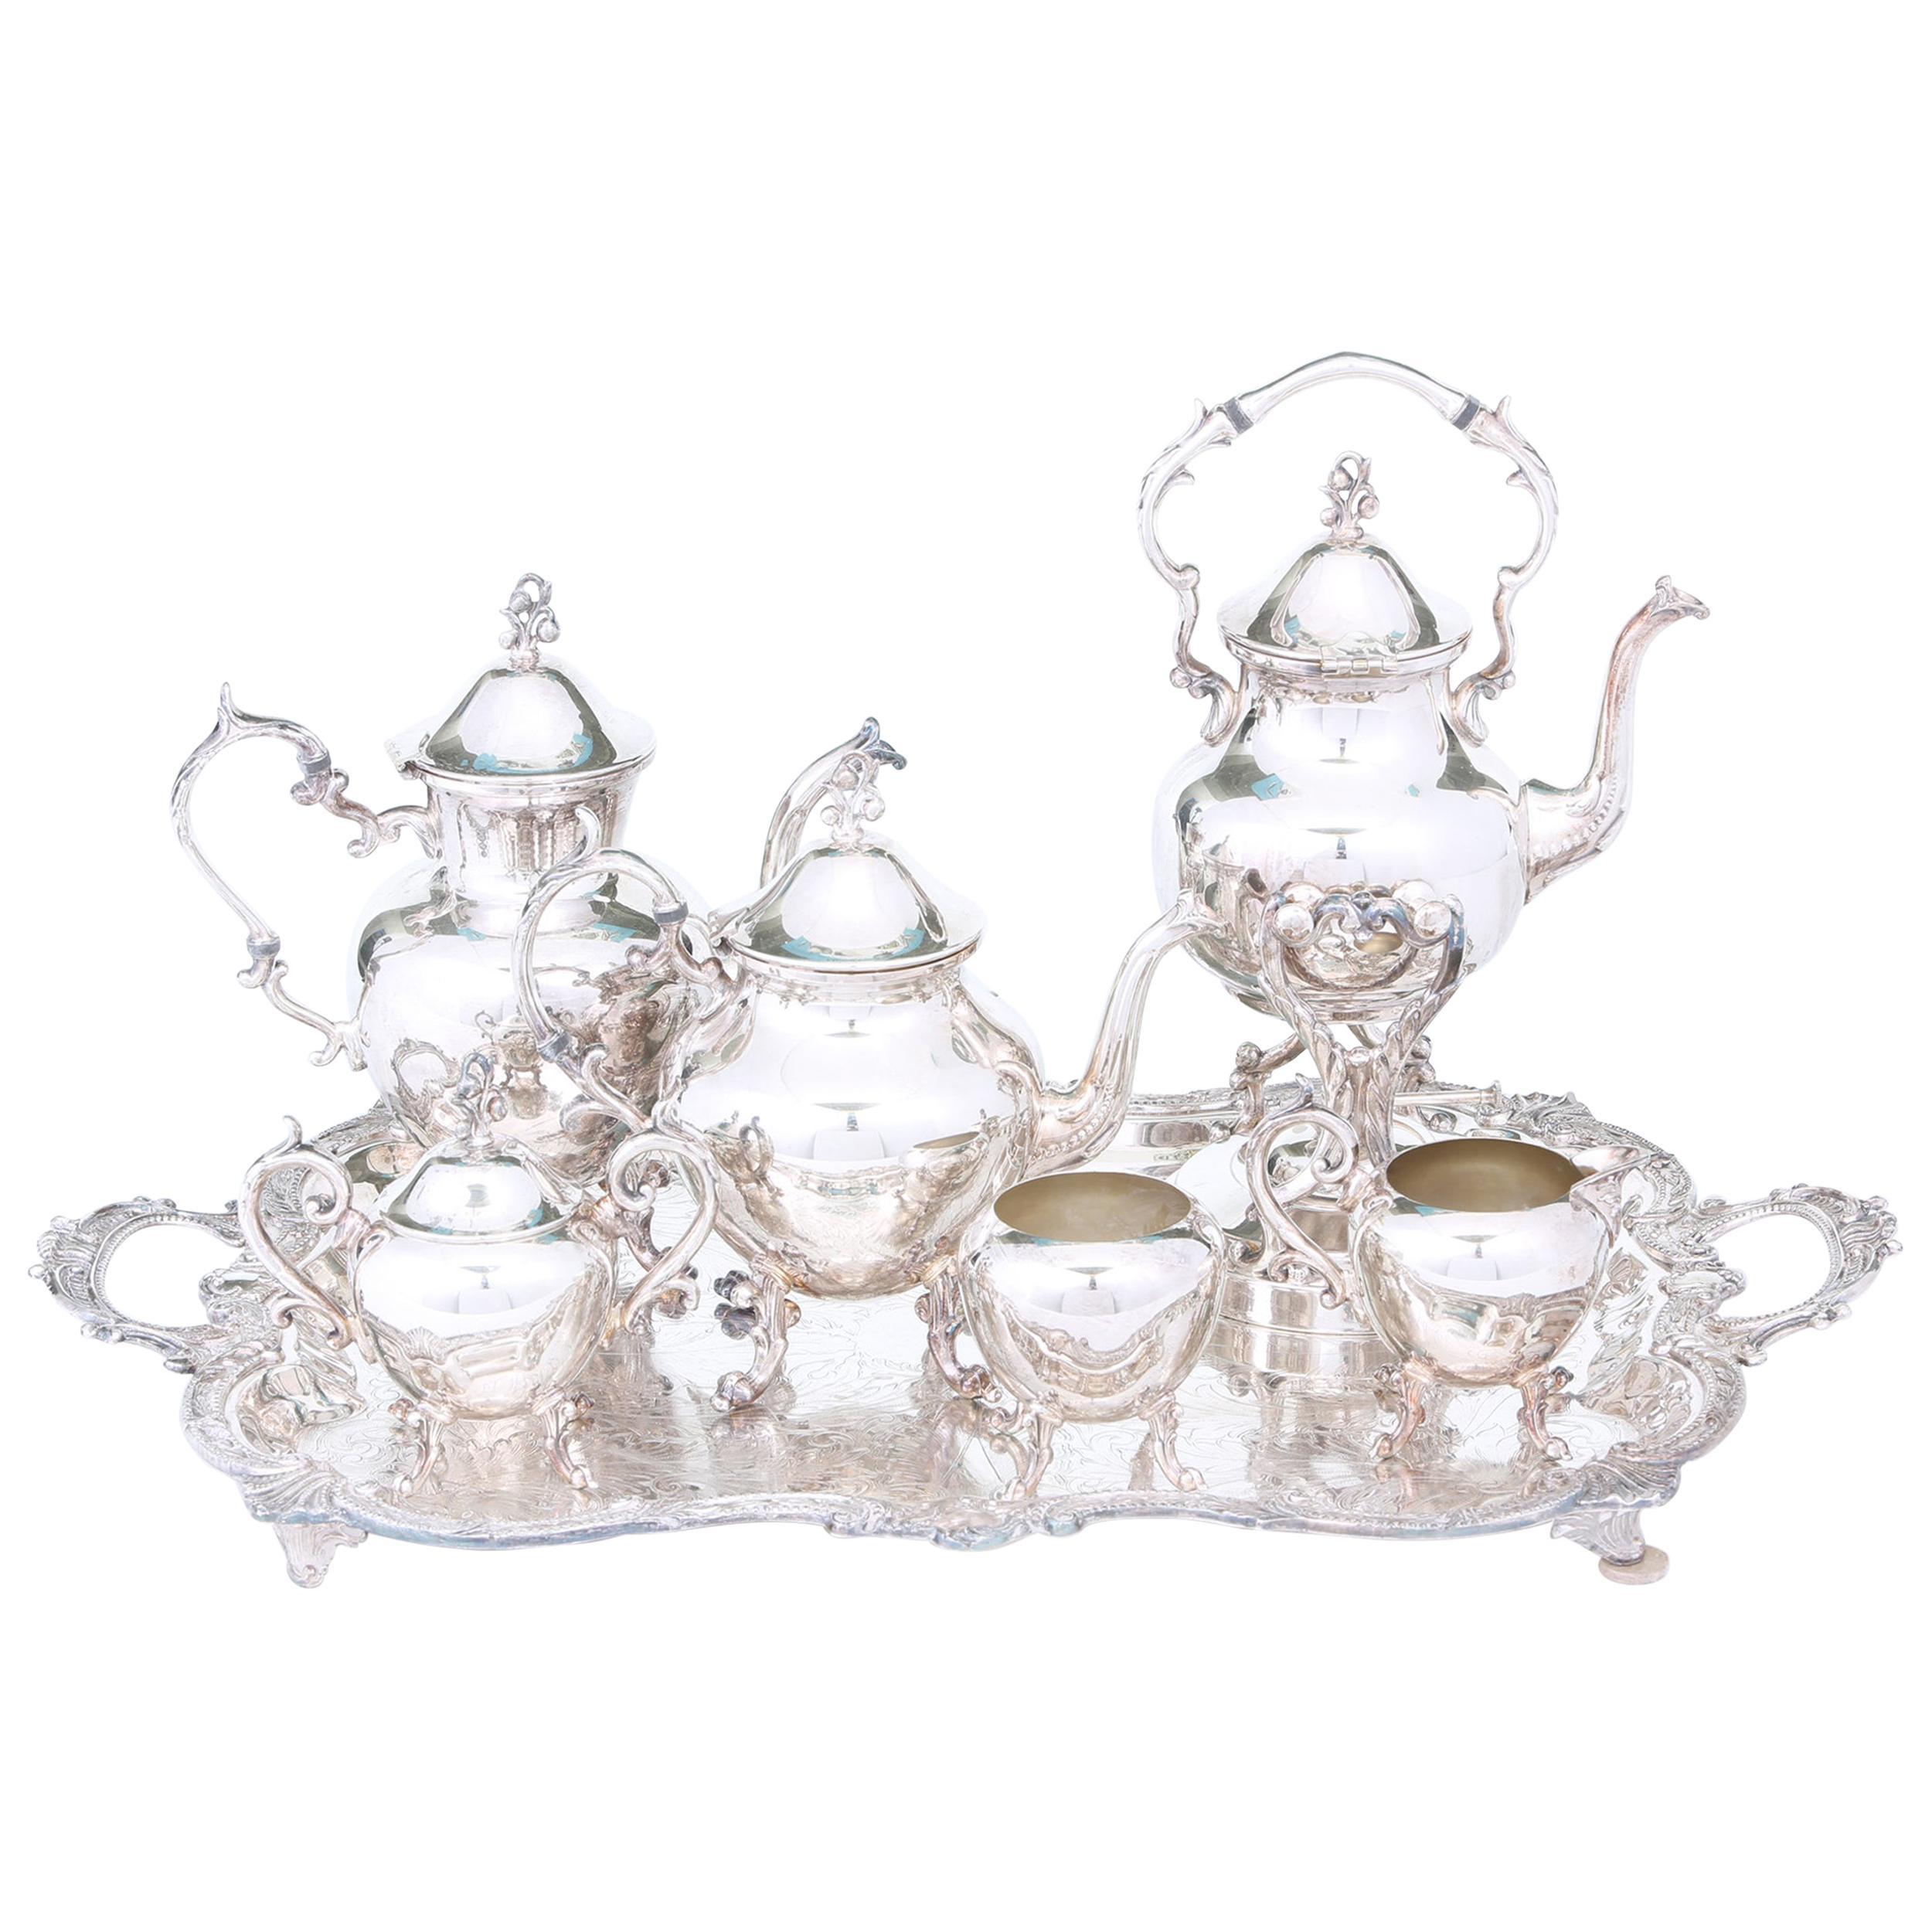 Beautiful English Silver Plate Tea / Coffee Service